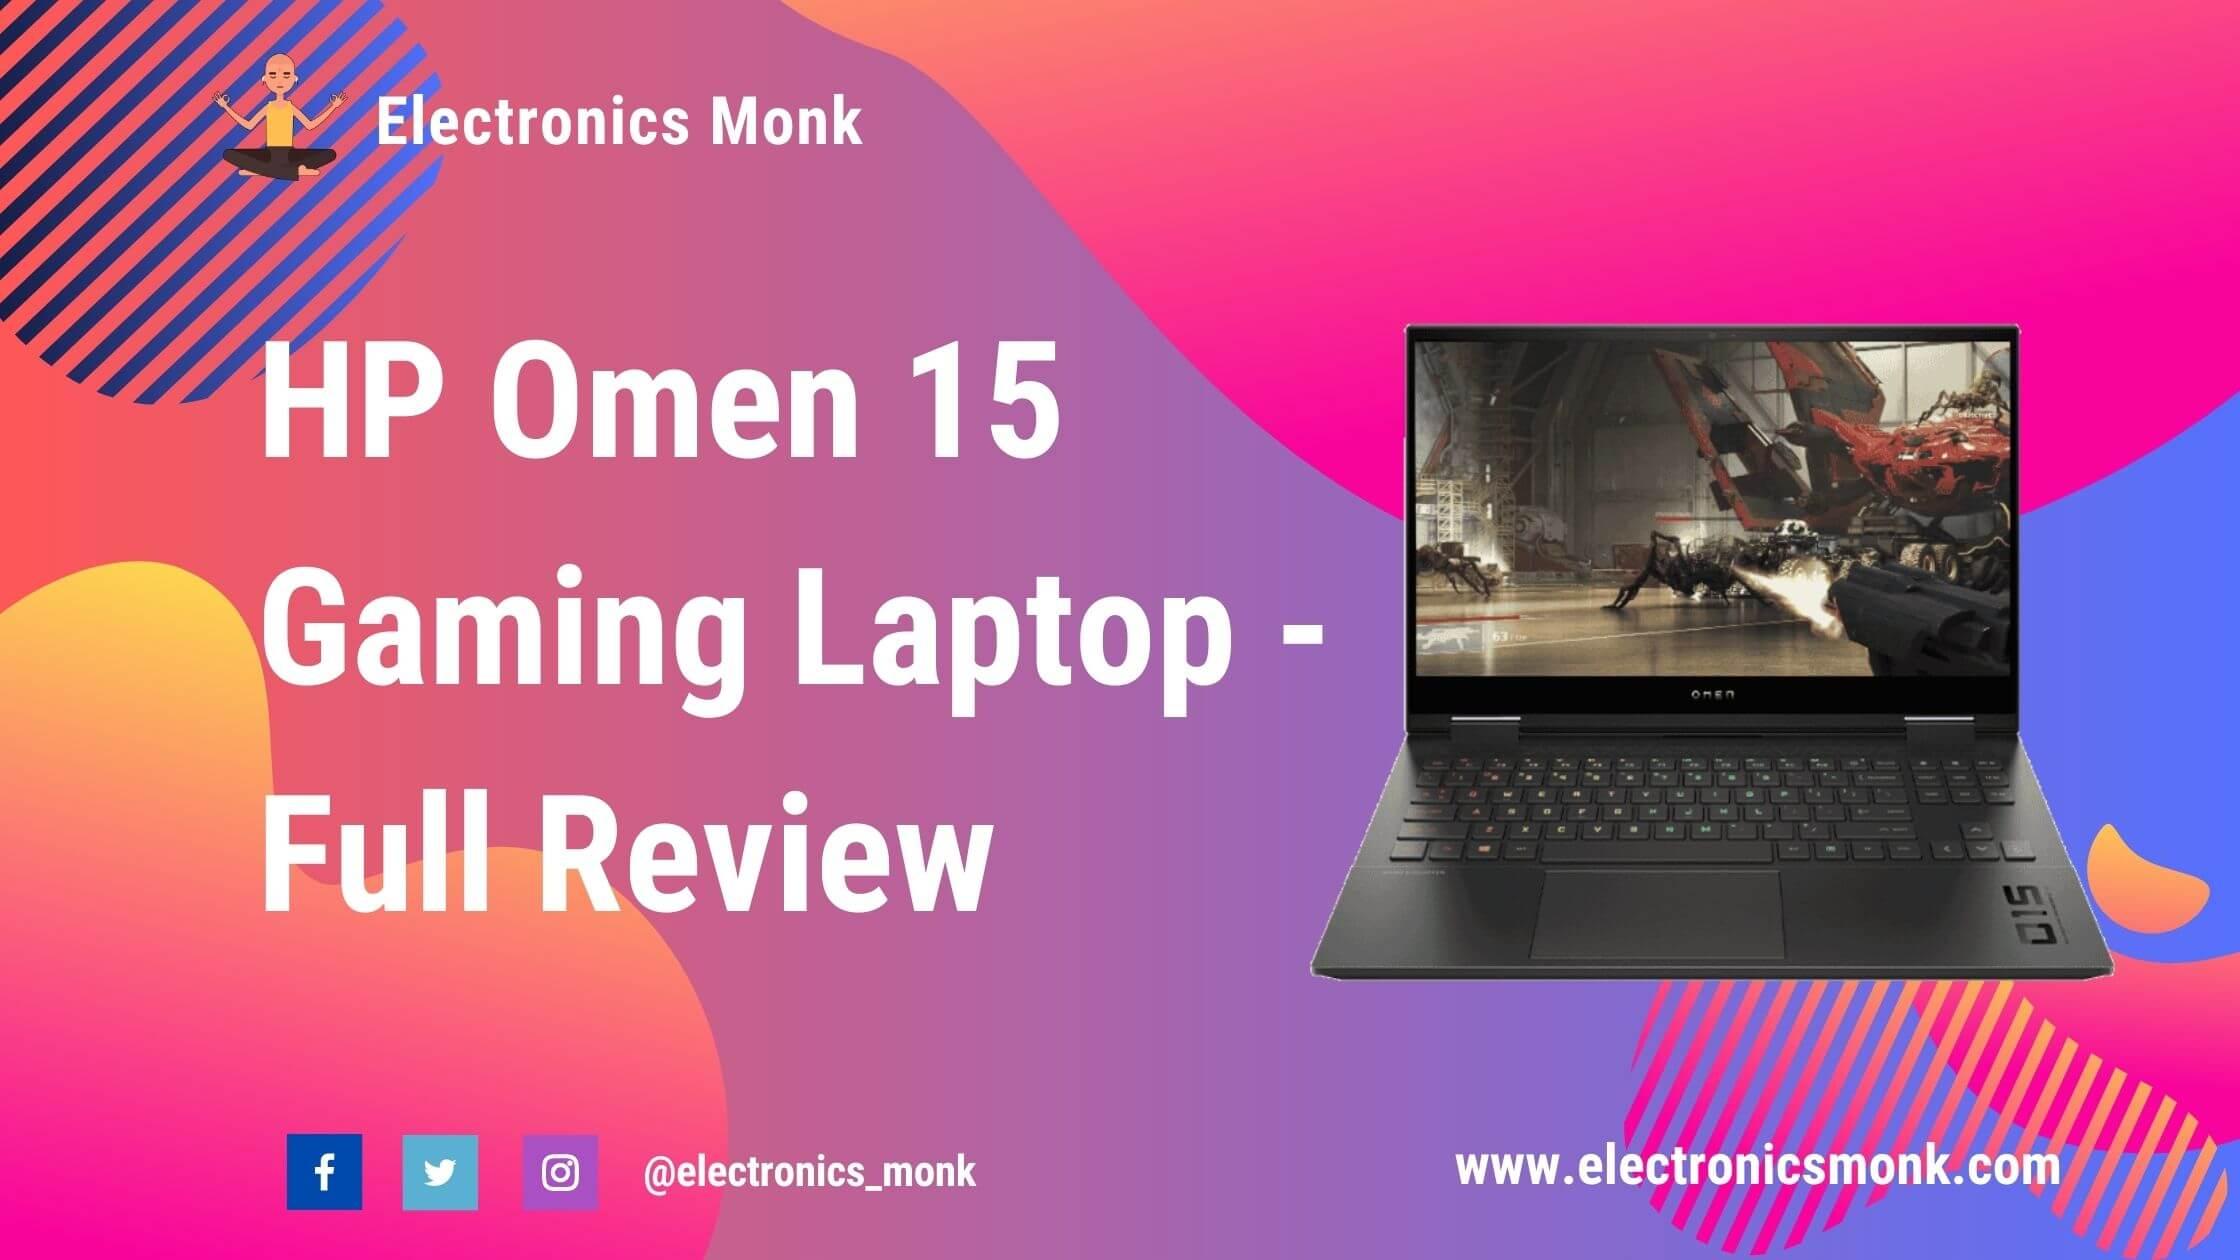 HP Omen 15 Gaming Laptop - Full Review